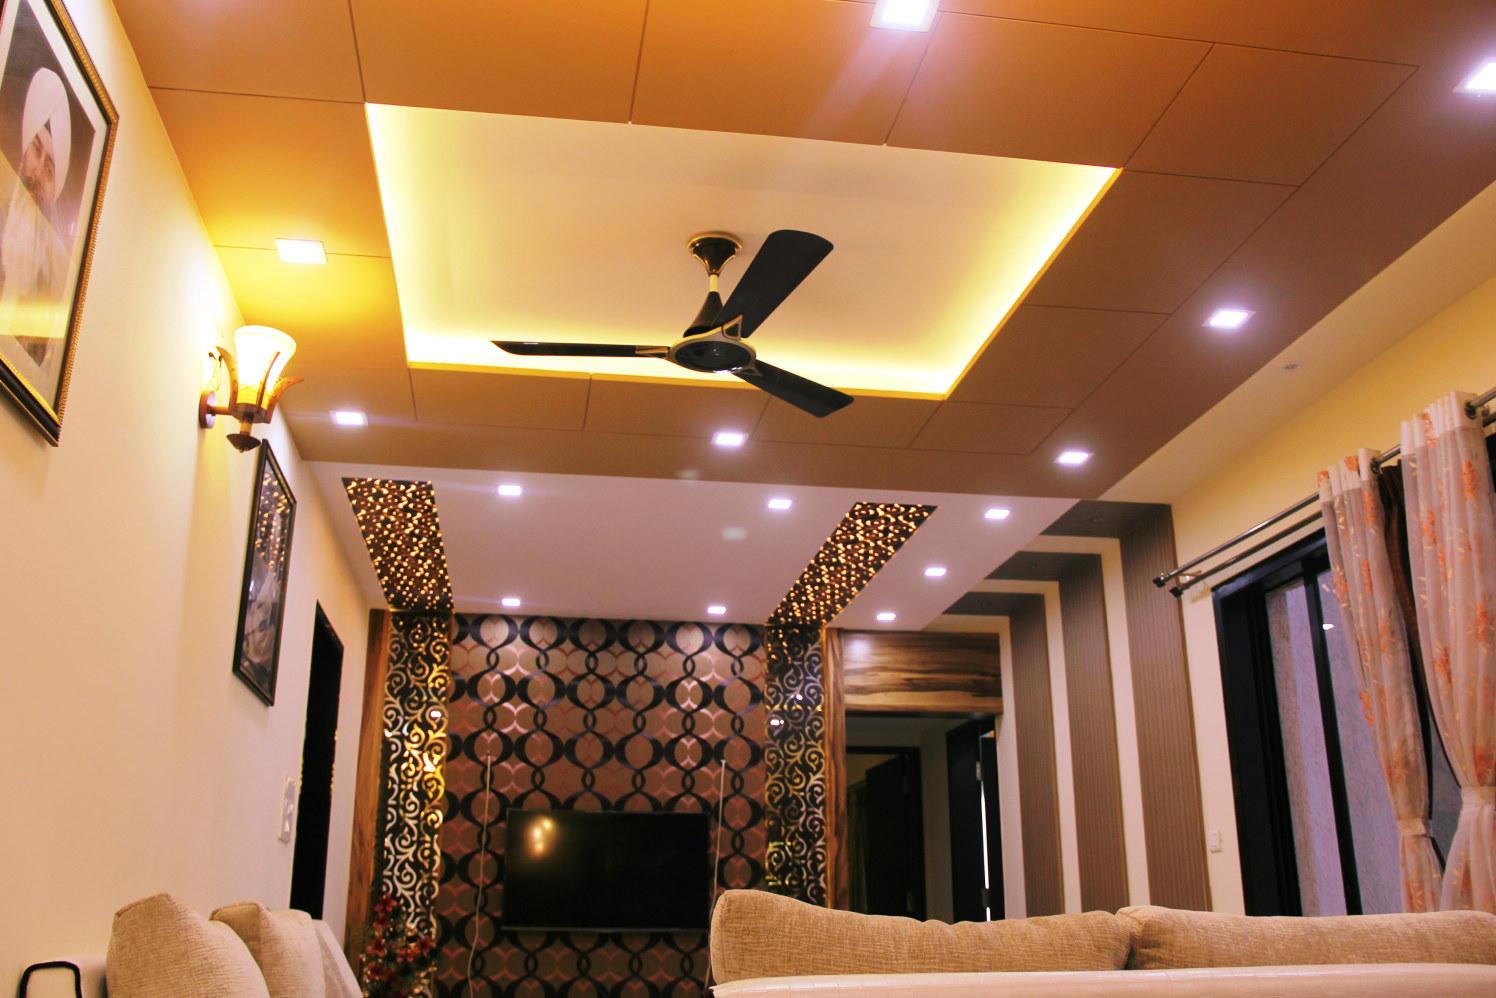 Living Area With Textured Wall And Designer Ceiling by Vibhuti Fotedar Living-room Contemporary | Interior Design Photos & Ideas